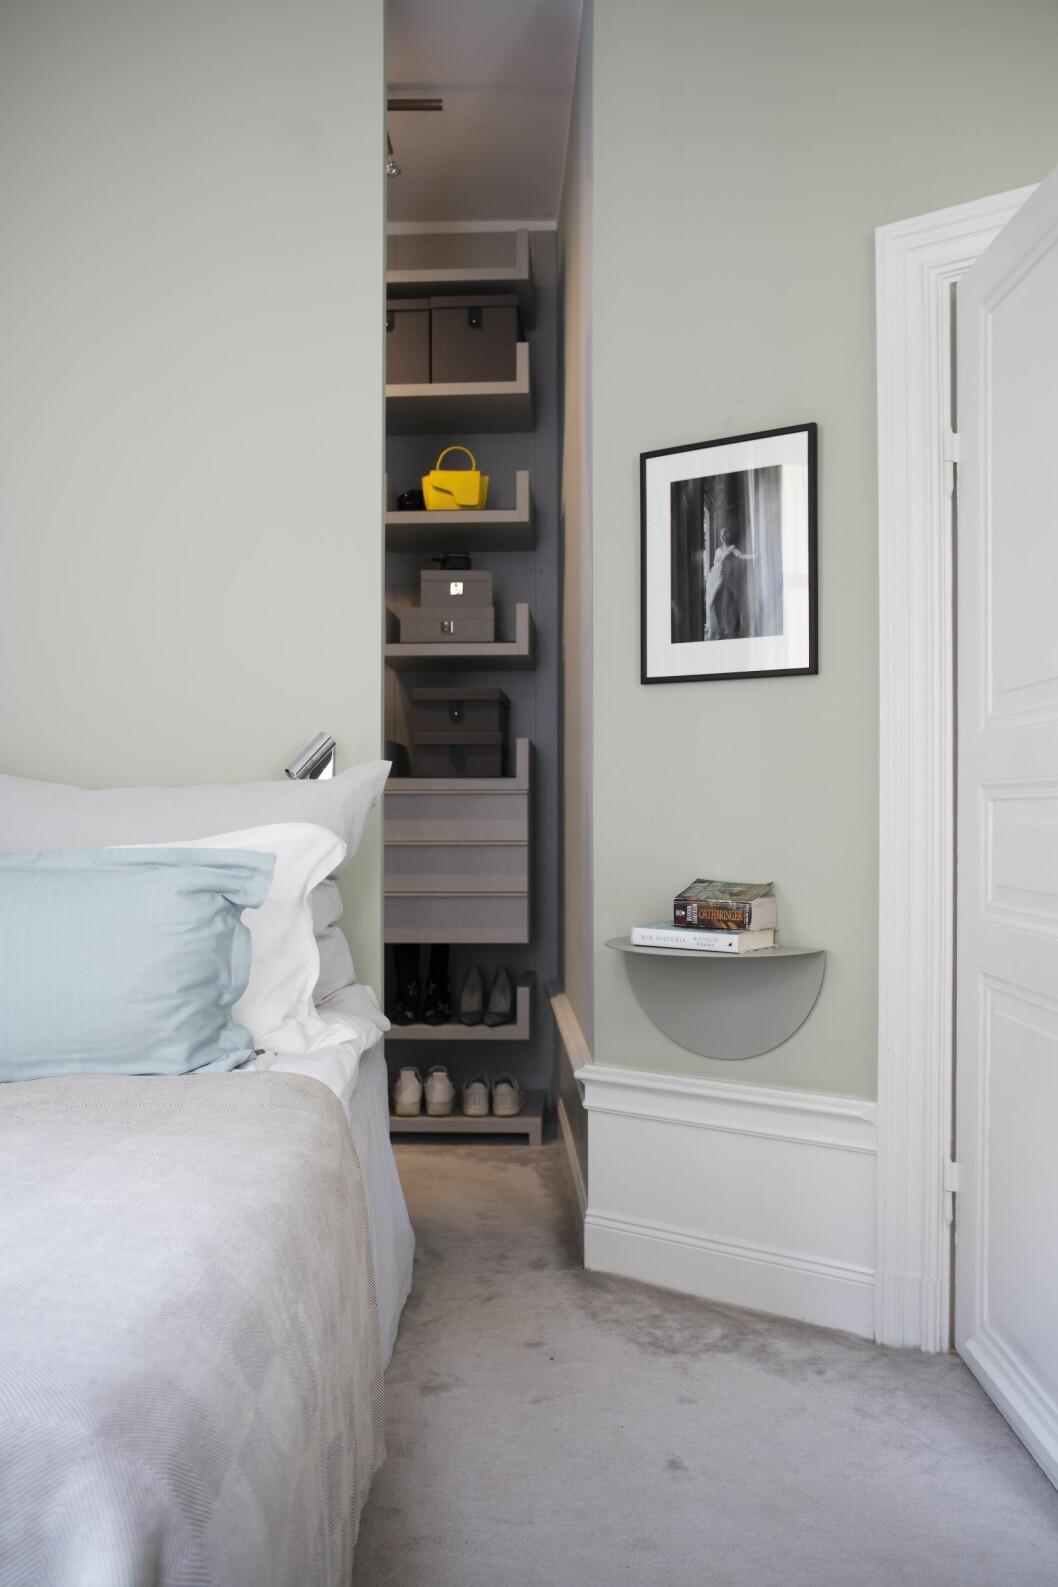 compact living-klädrum i sovrum